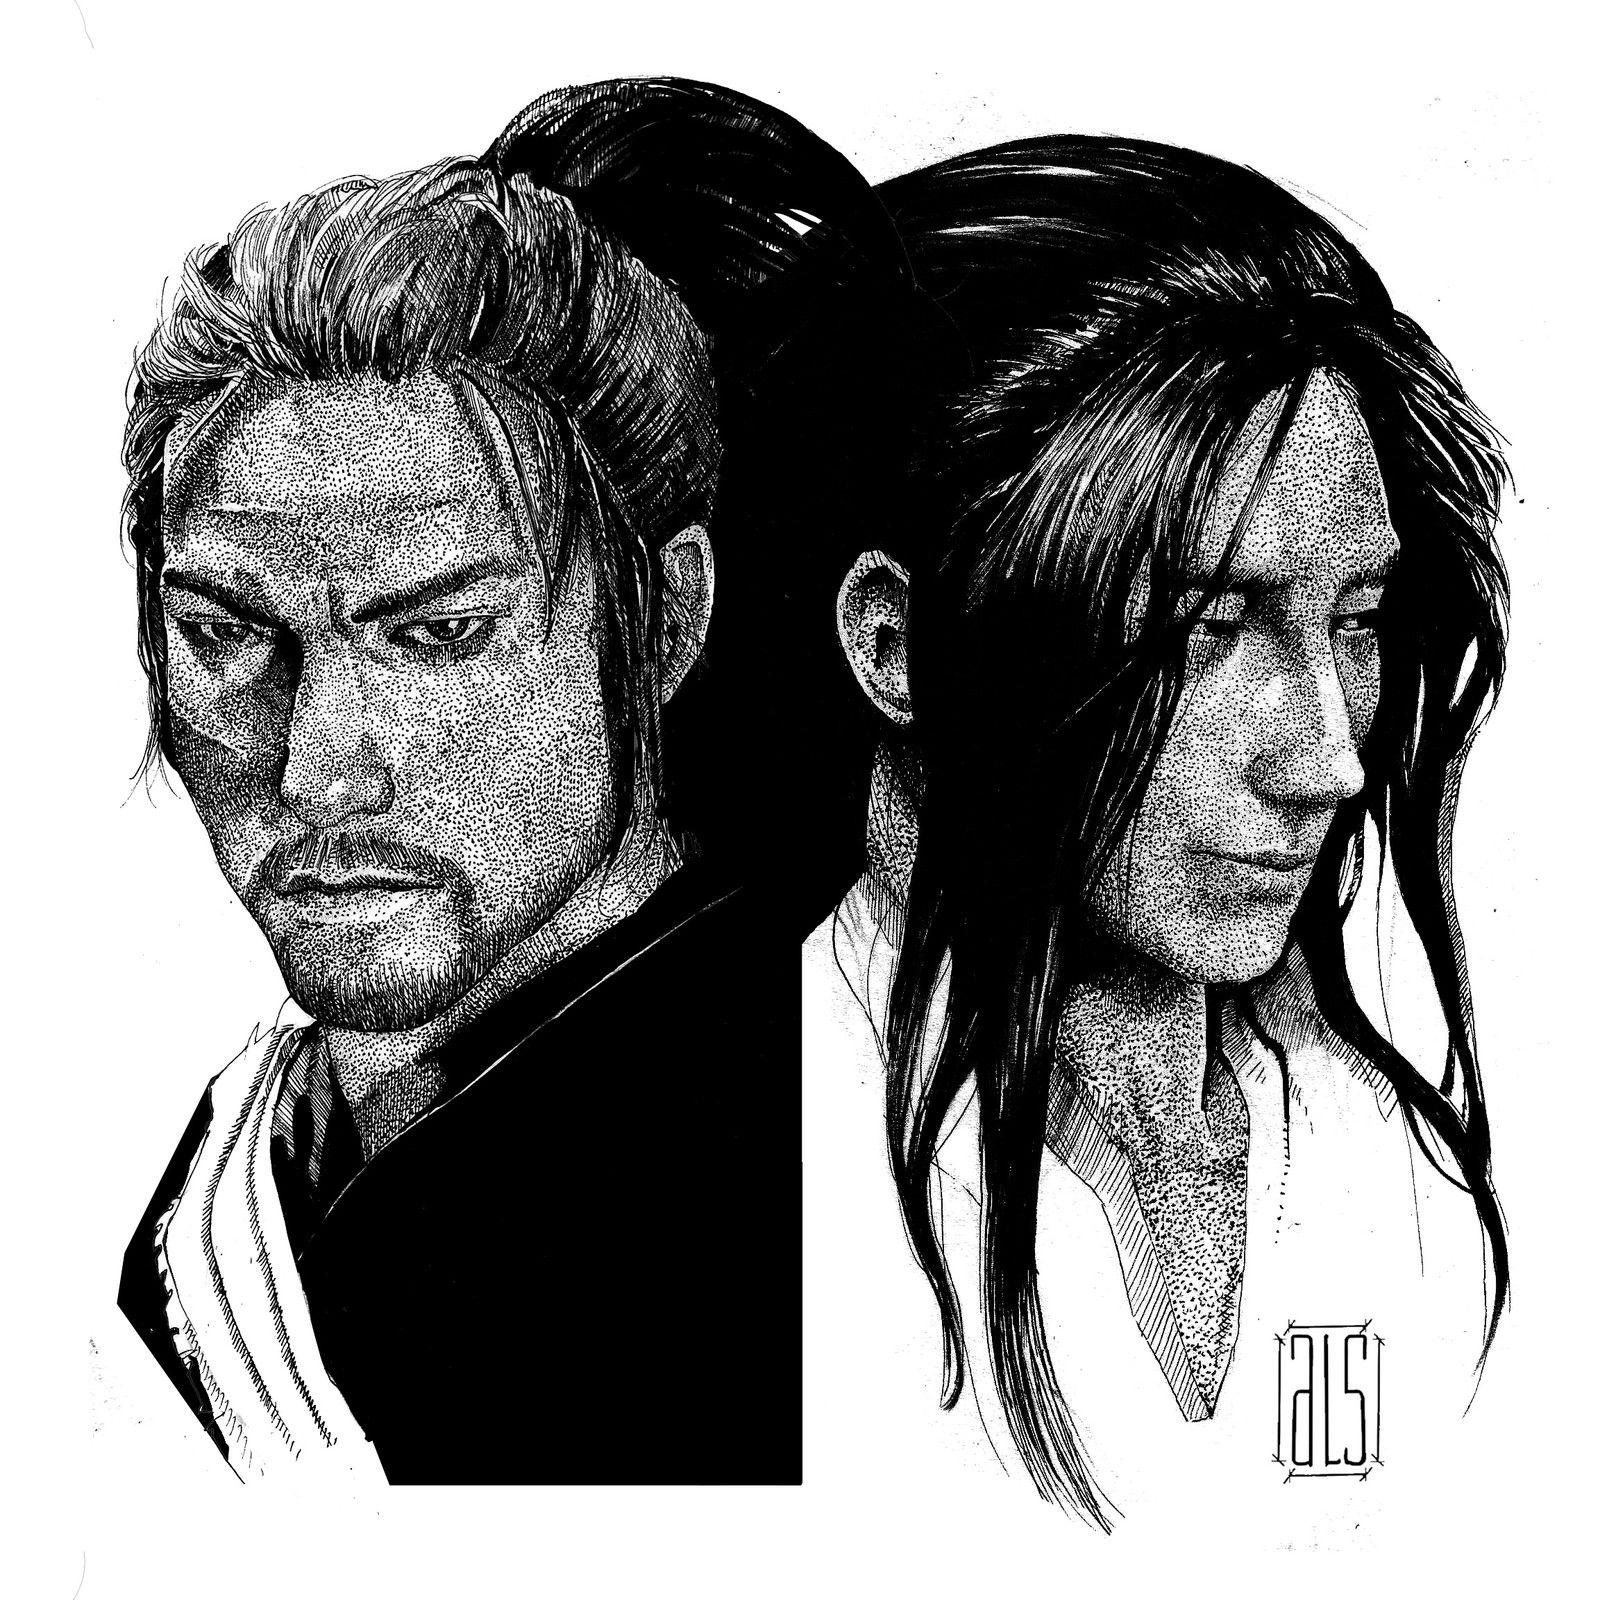 Sasaki Kojiro And Miyamoto Musashi: Inoue Takehiko's Vagabond, Miyamoto Musashi And Sasaki